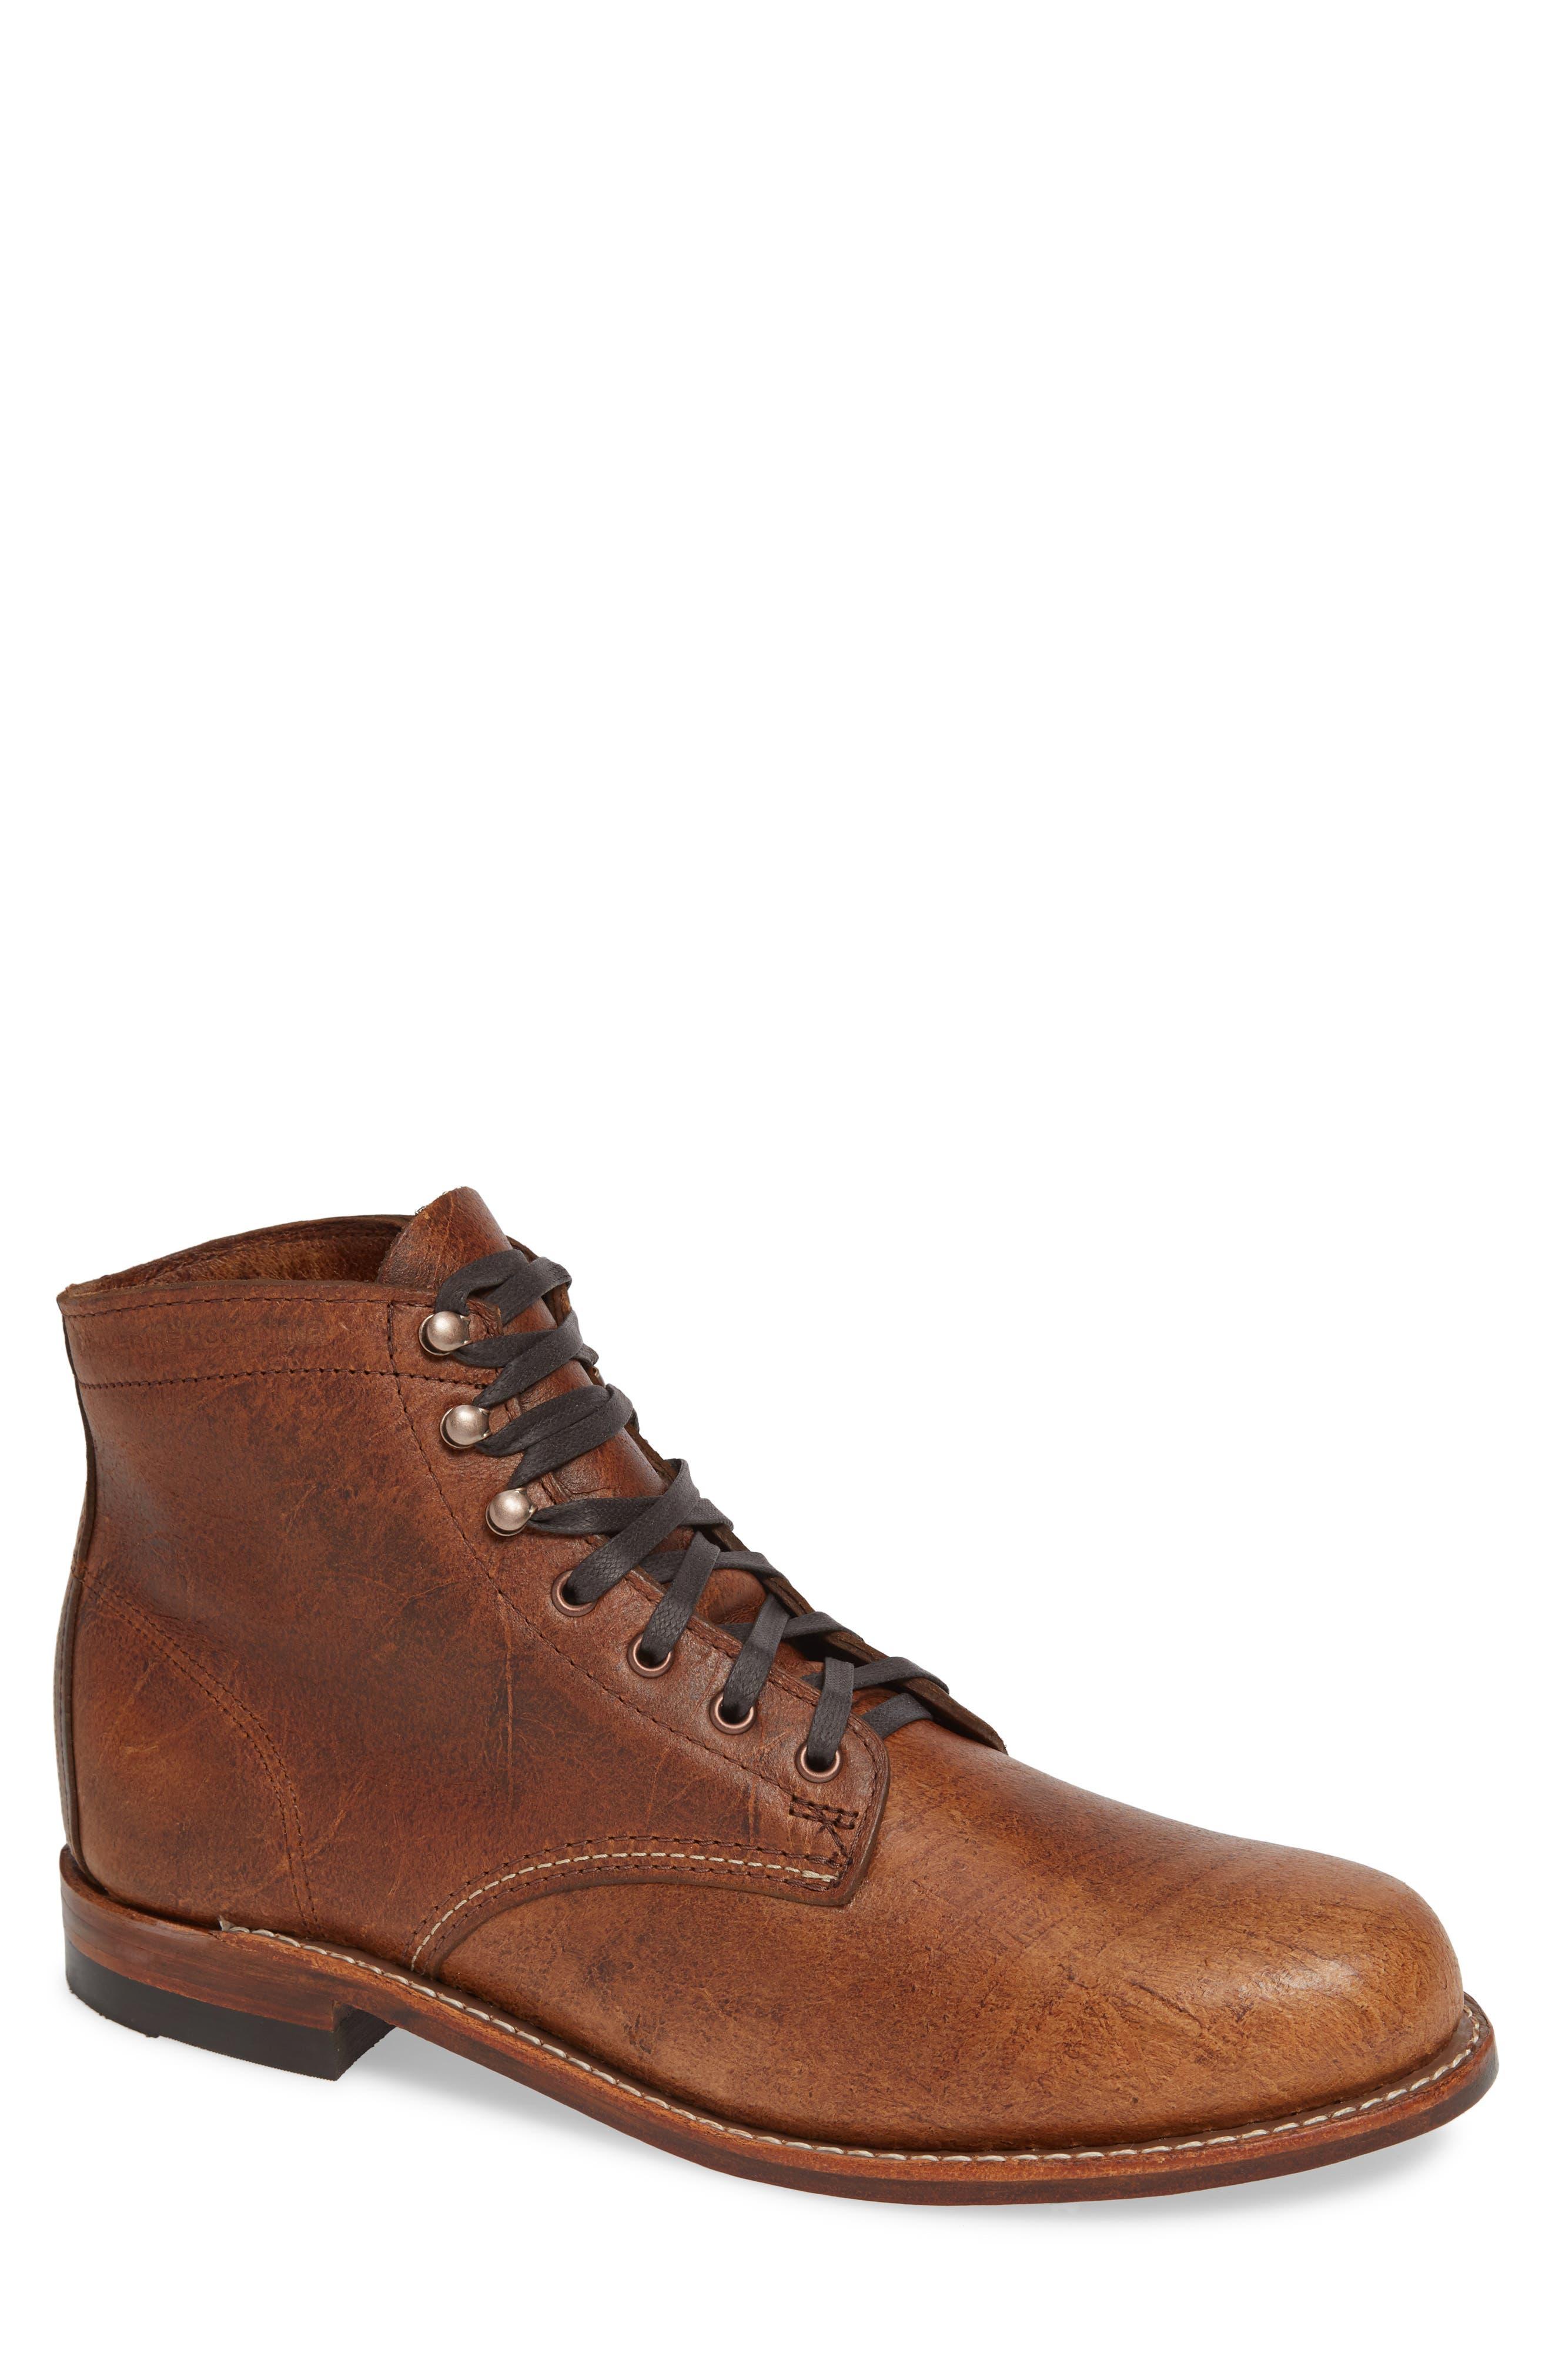 WOLVERINE '1000 Mile' Plain Toe Boot in Cognac